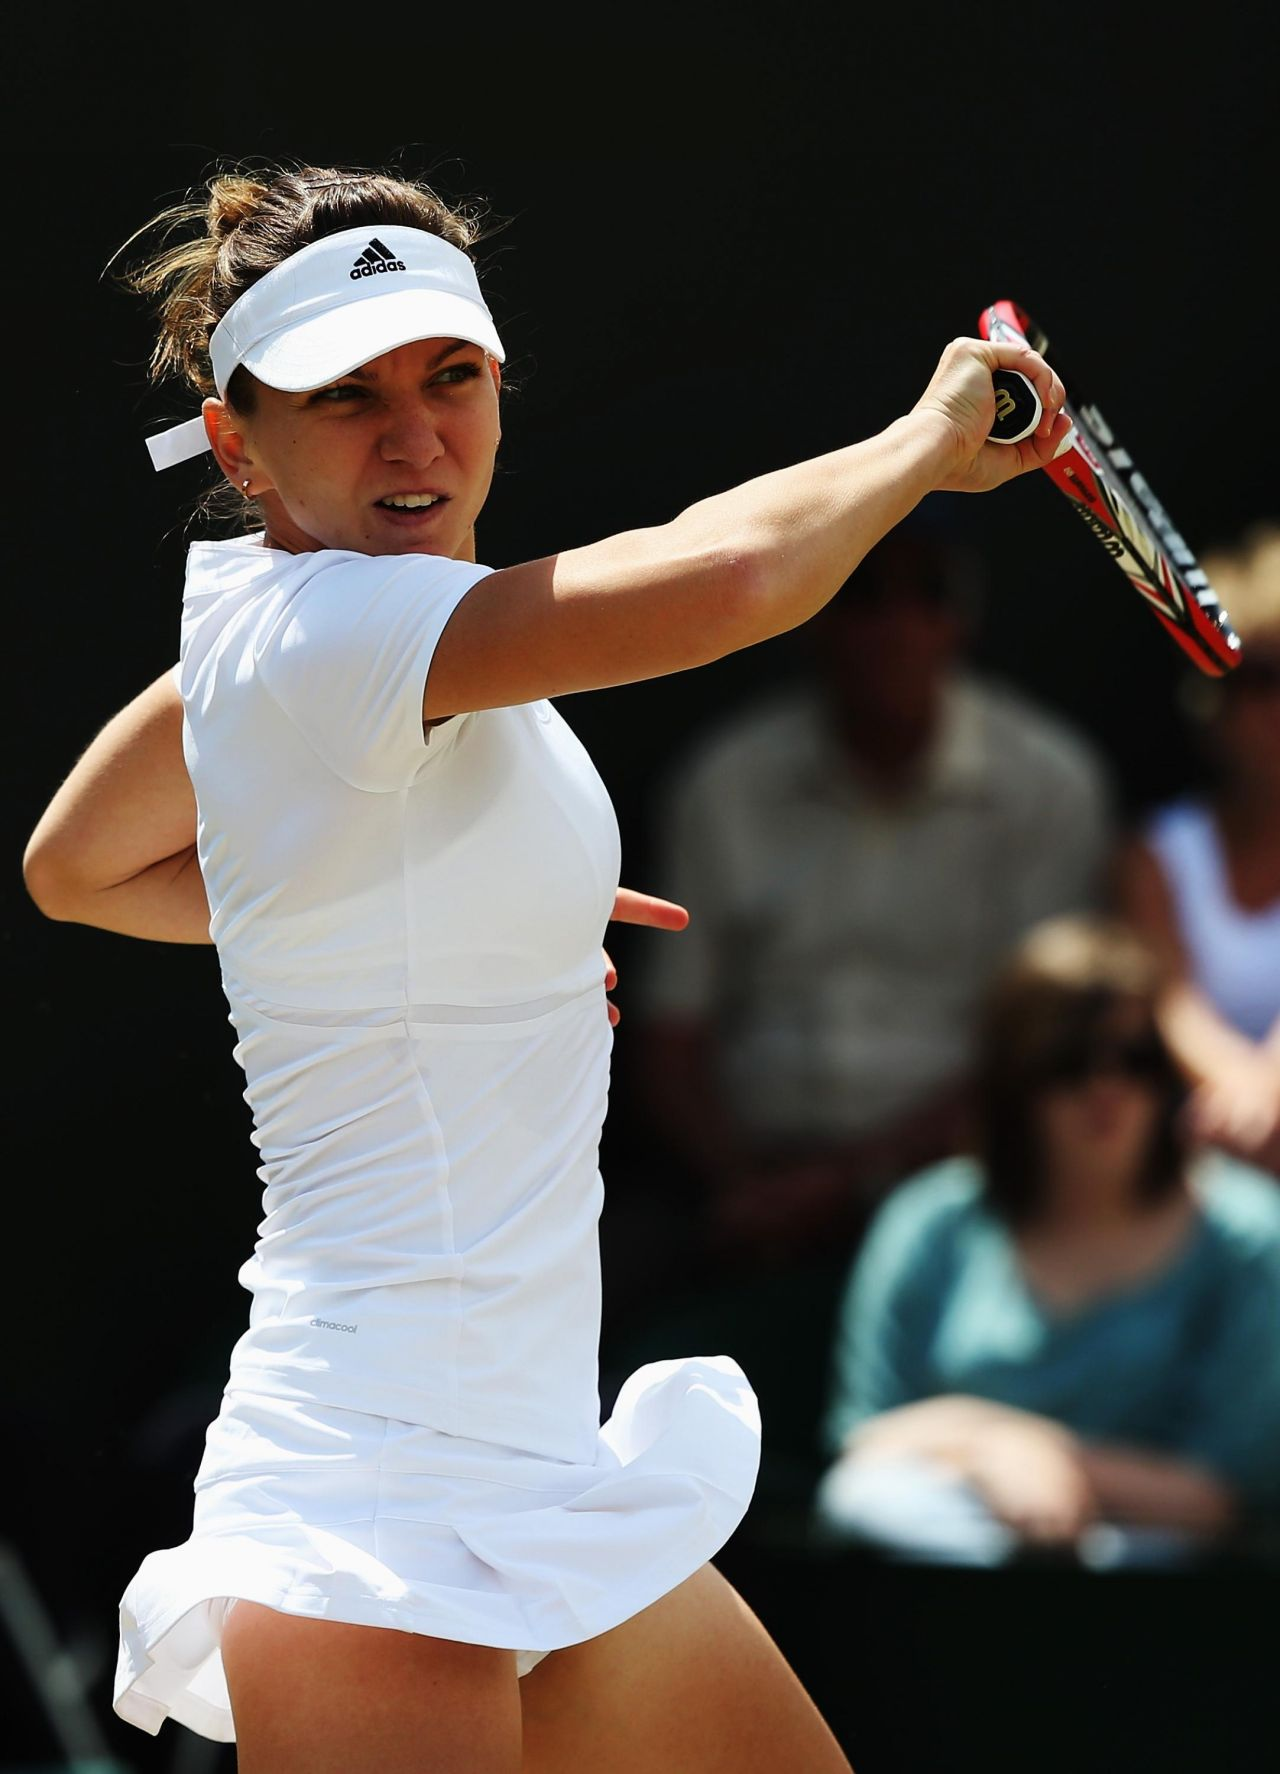 Simona Halep Wimbledon Tennis Championships 2014 3rd Round